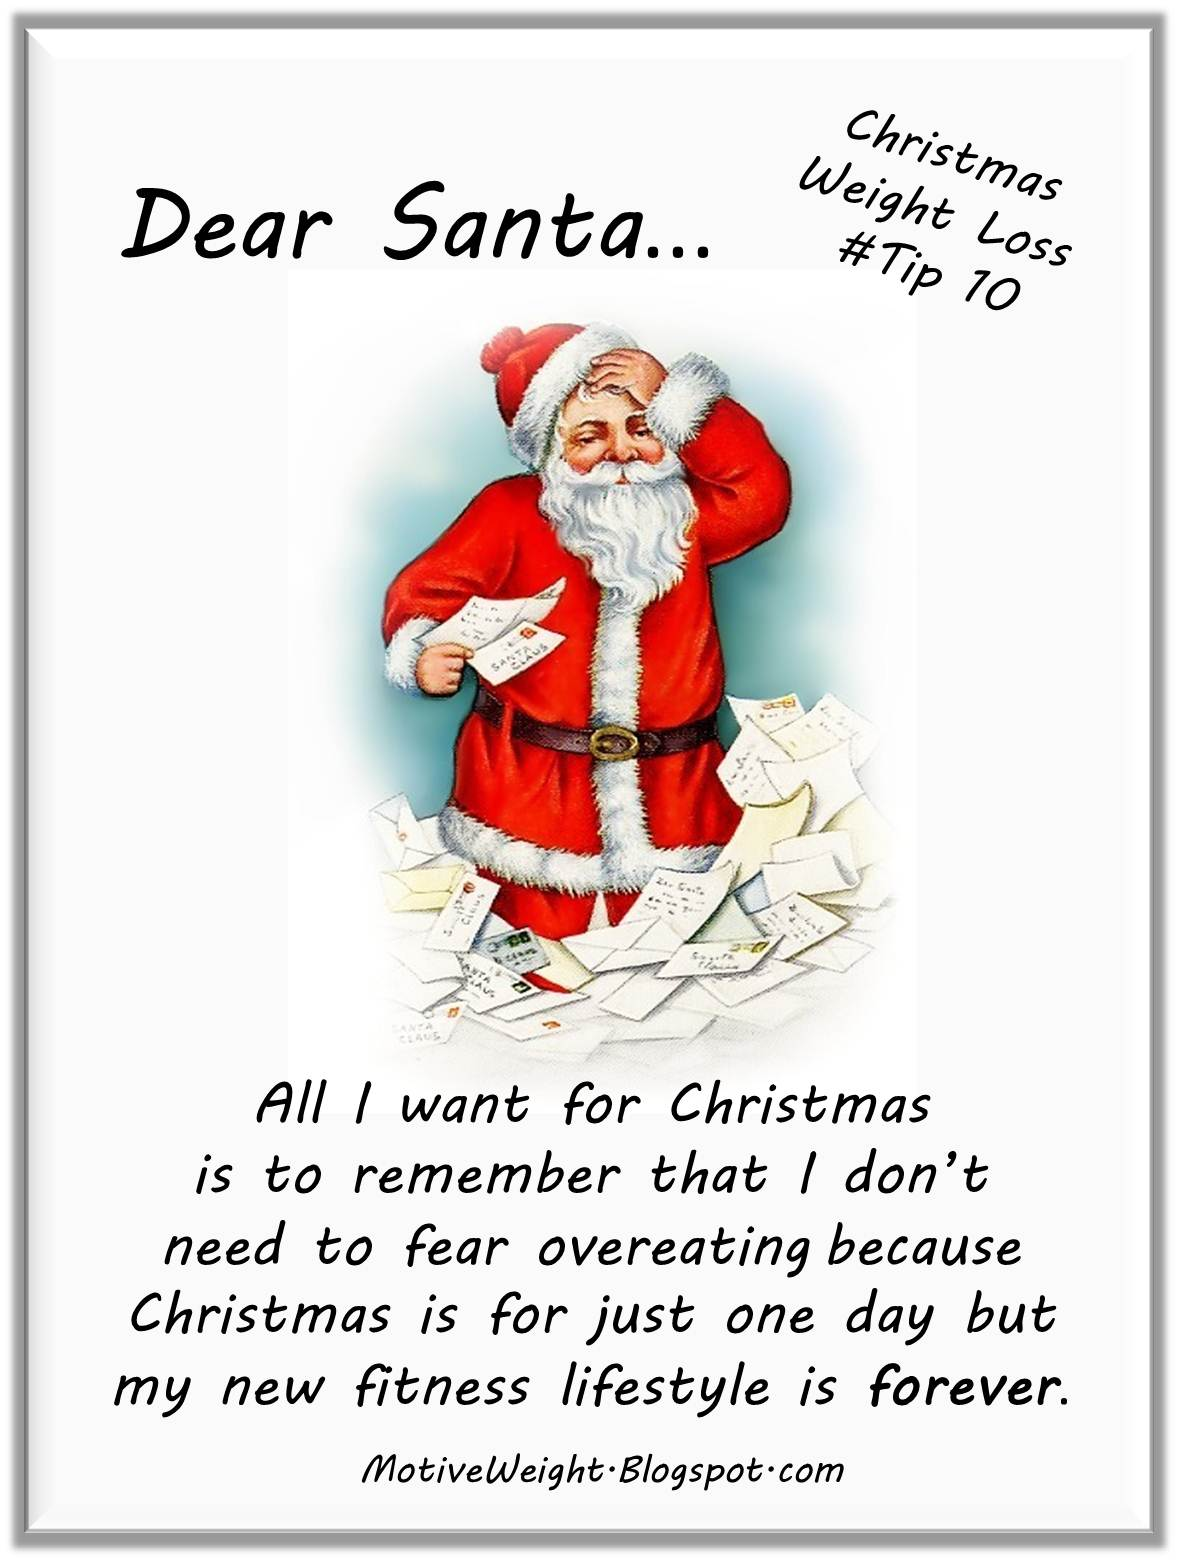 MotiveWeight: Christmas Weight Loss Tip # 10